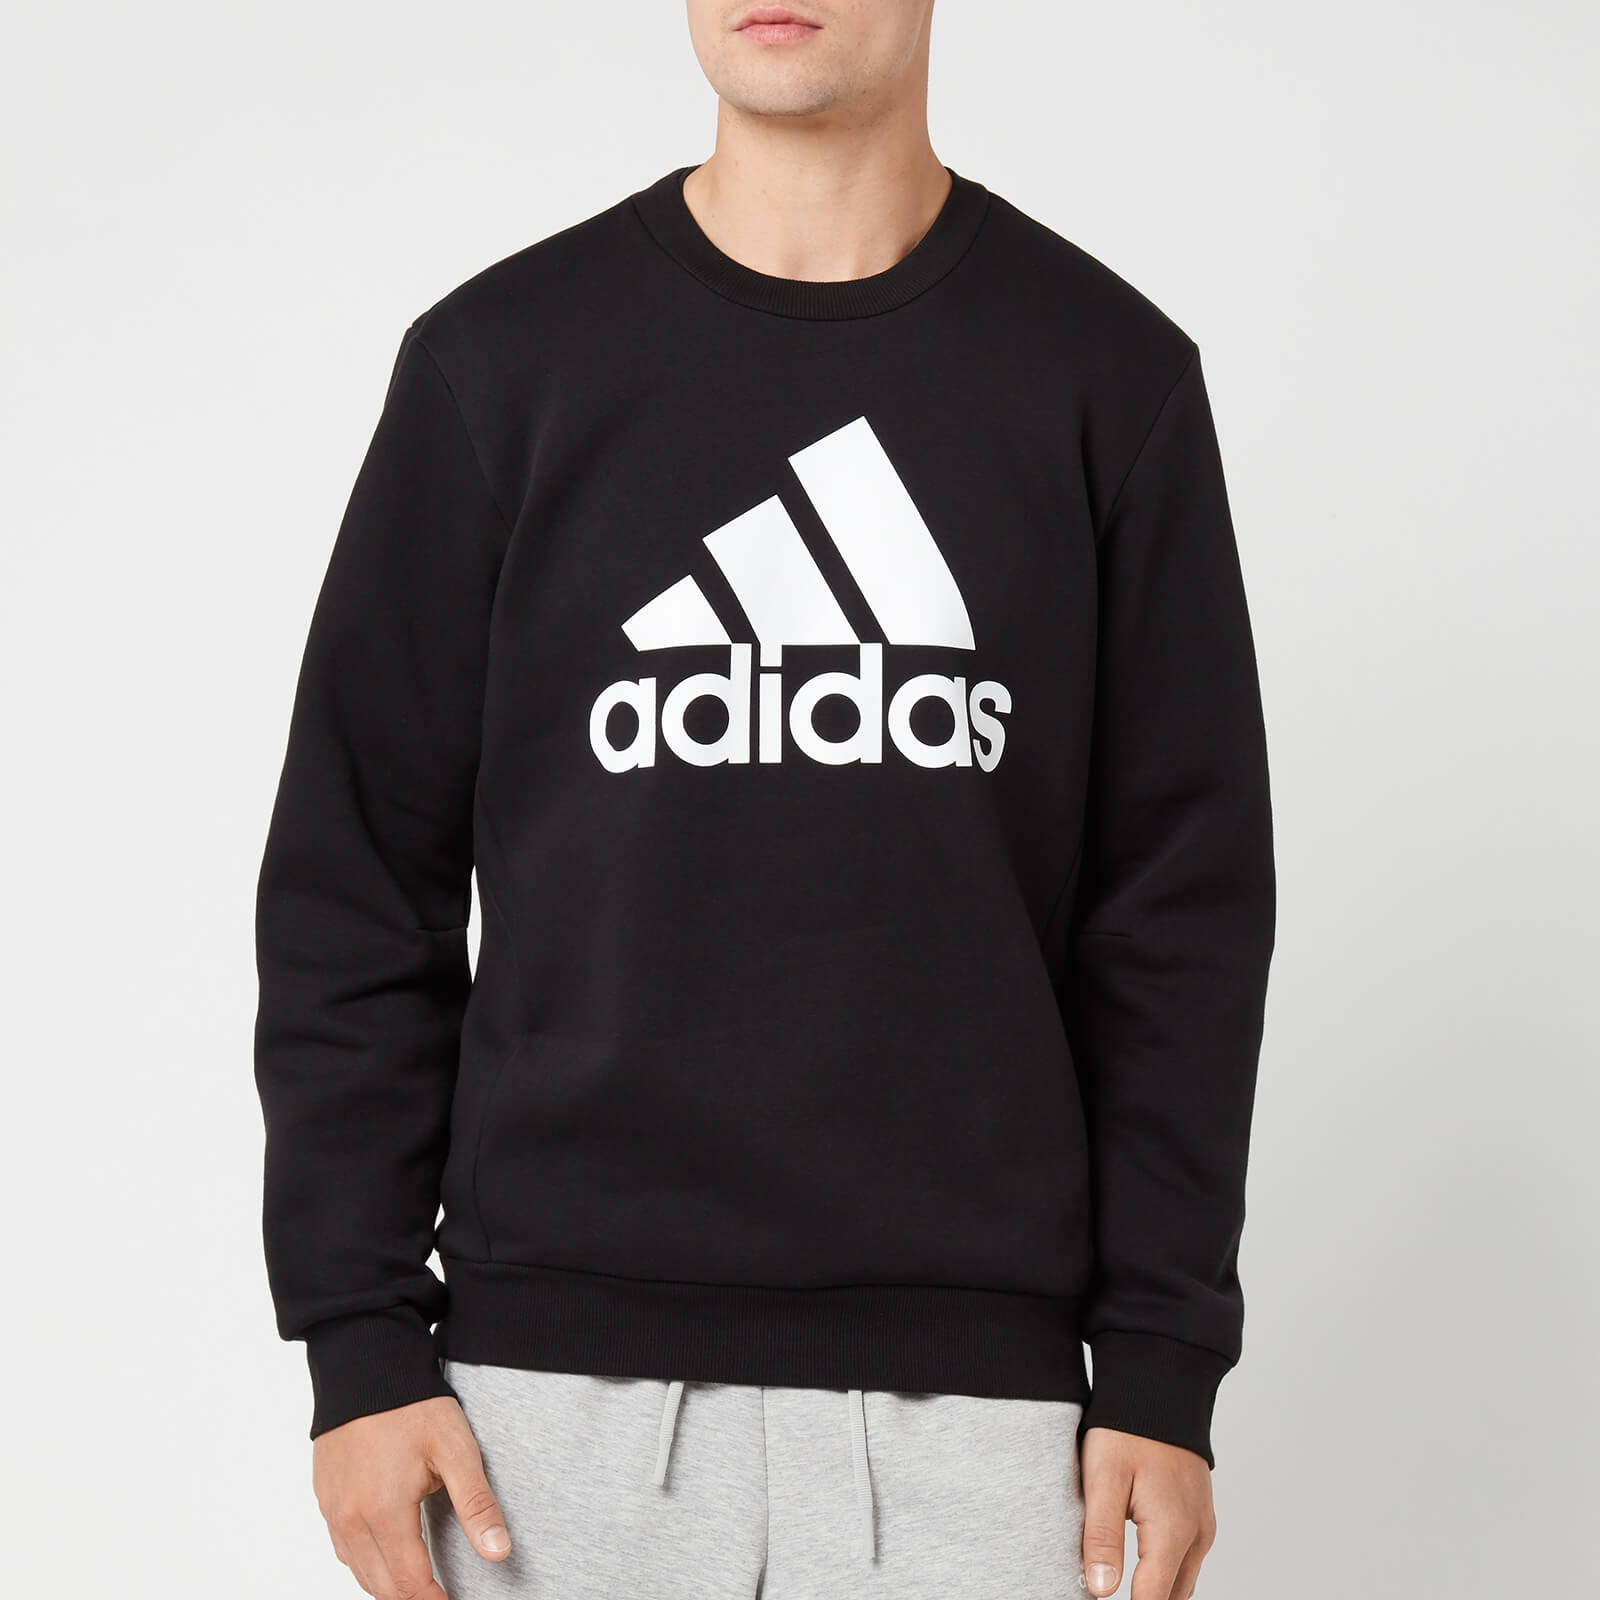 adidas Men's Mh Bos Crew Neck Sweatshirt - Black